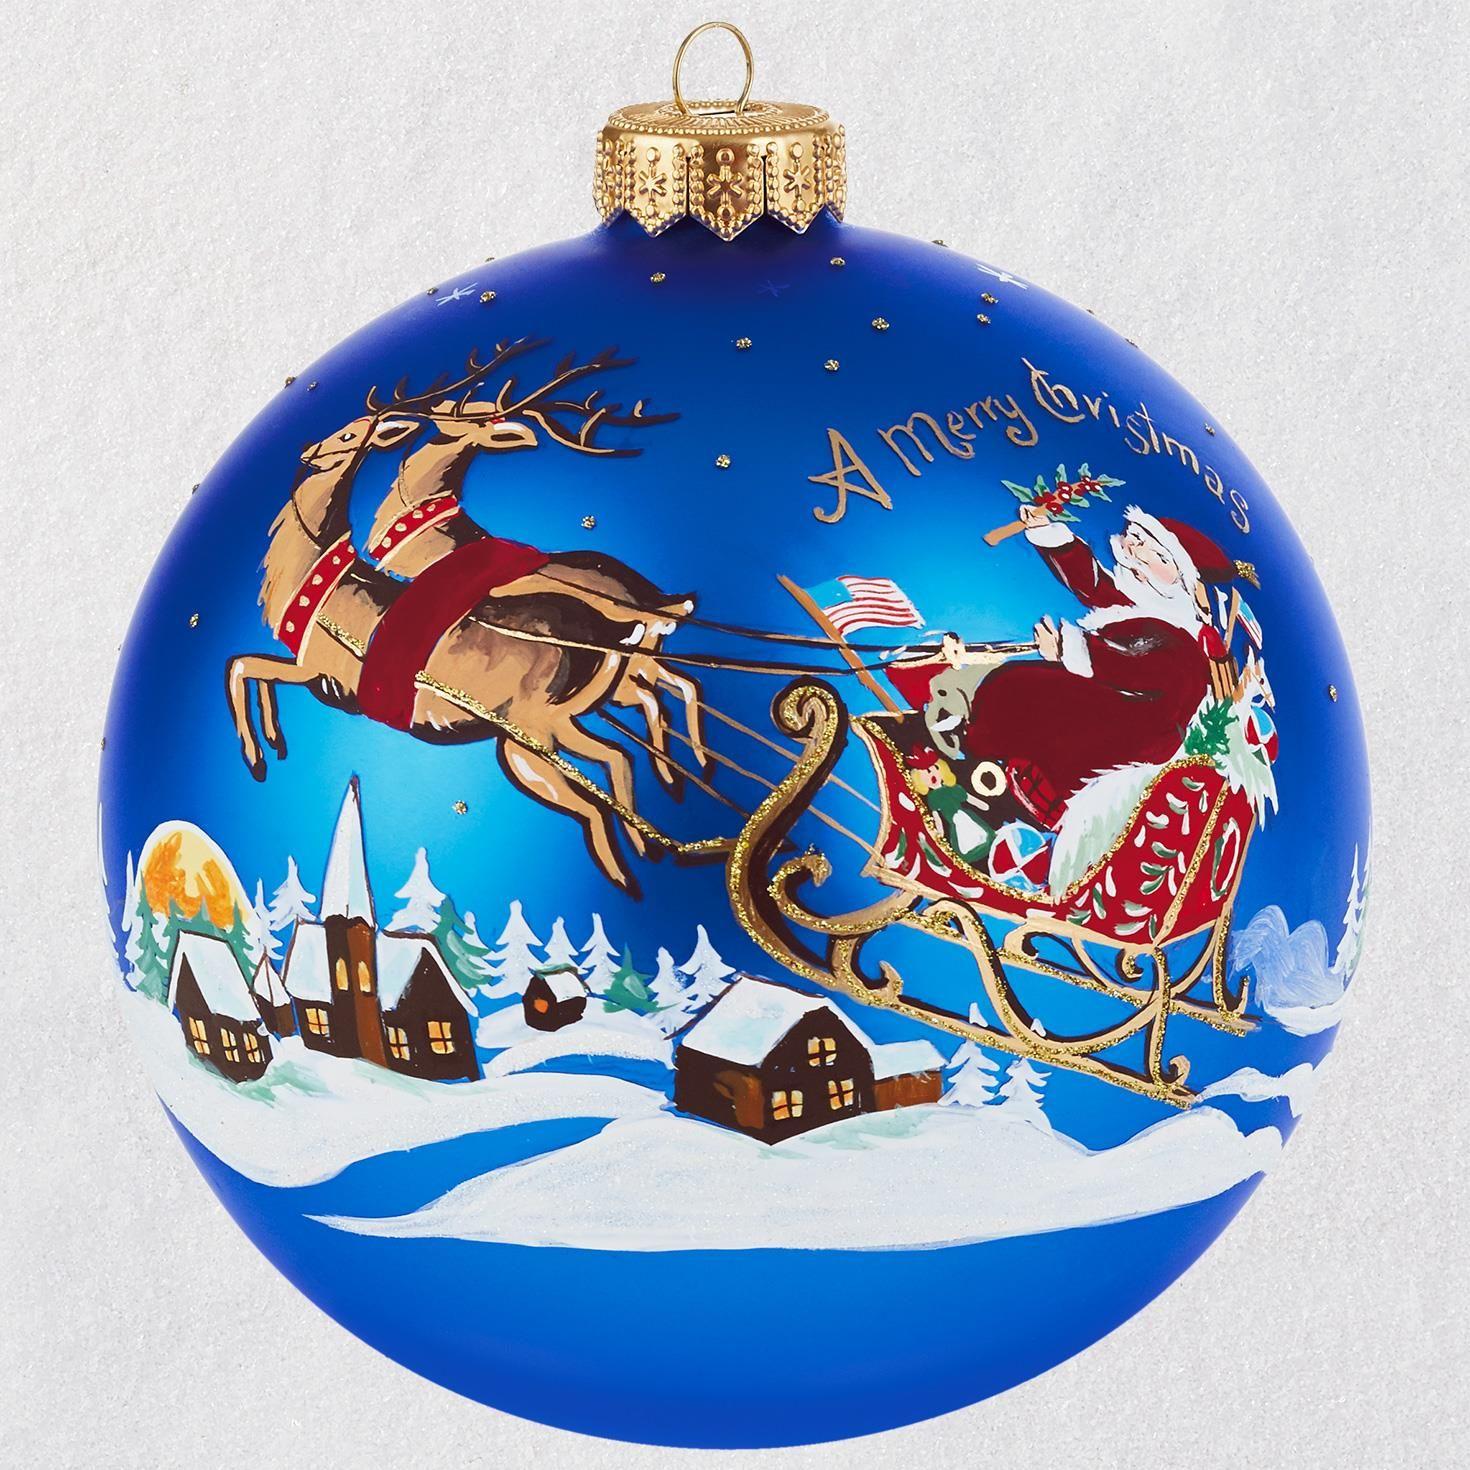 Santa's Ride Ball Blown Glass Ornament - Specialty Ornaments - Hallmark